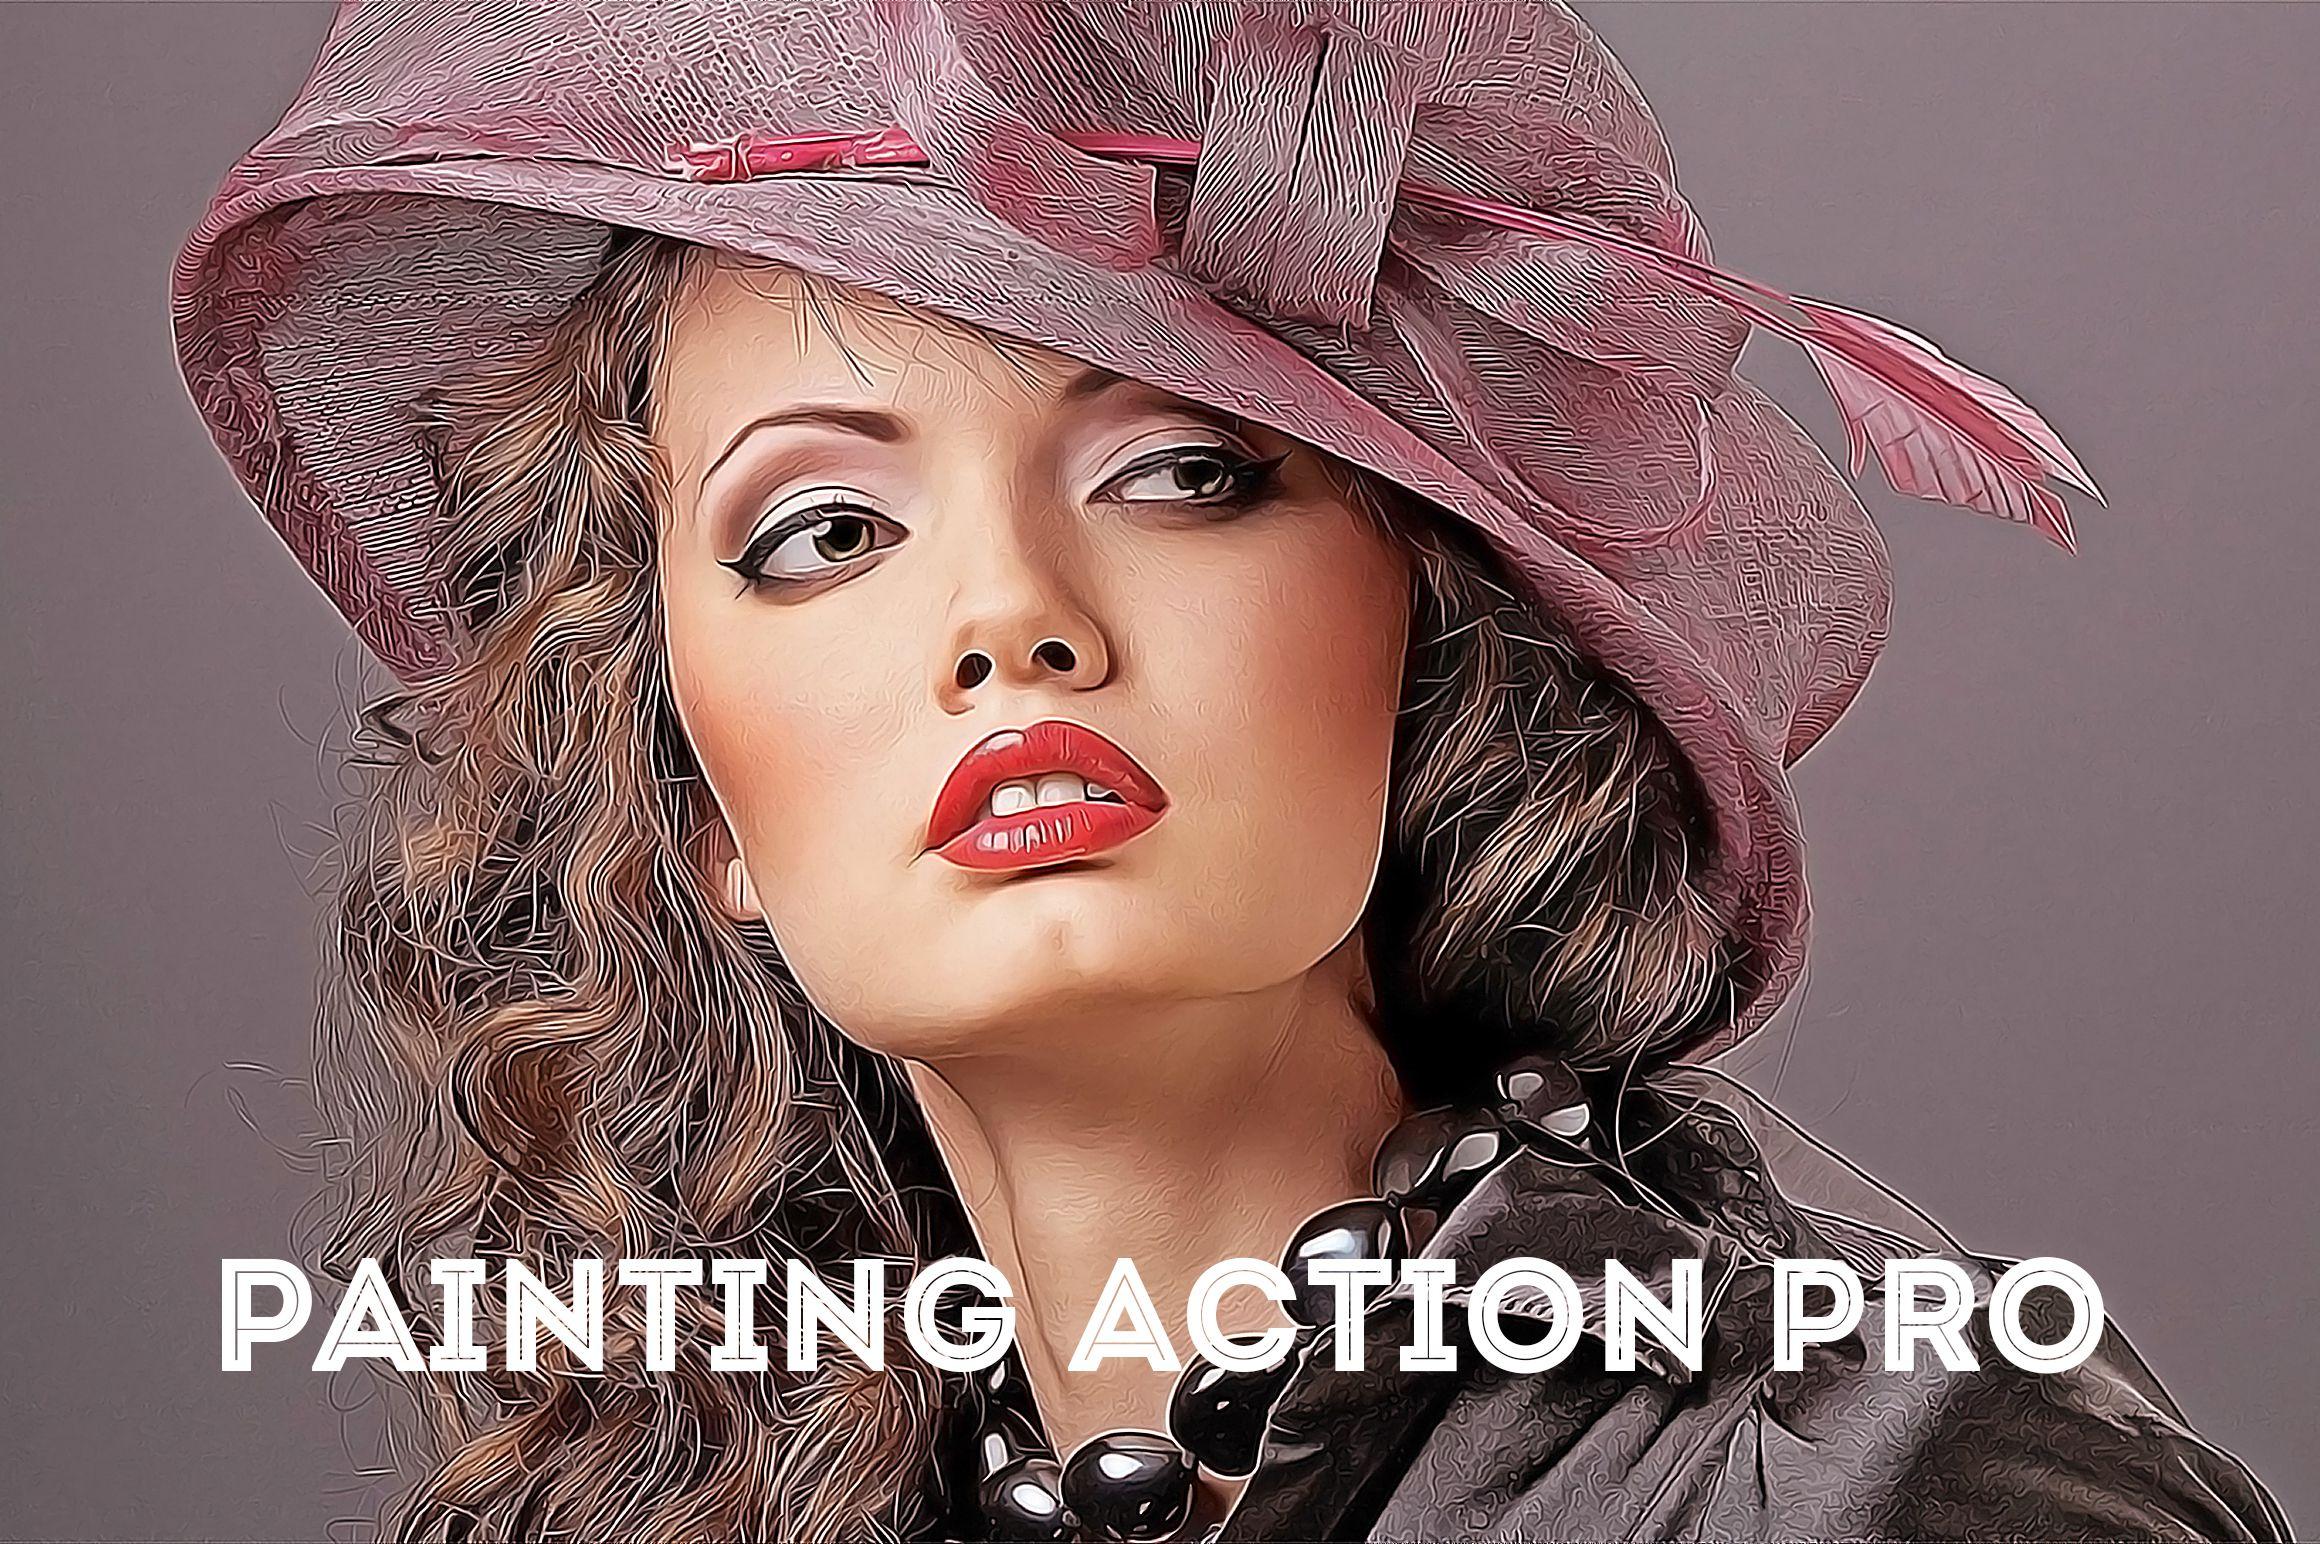 Painting Action Pro! (Photoshop) example image 1